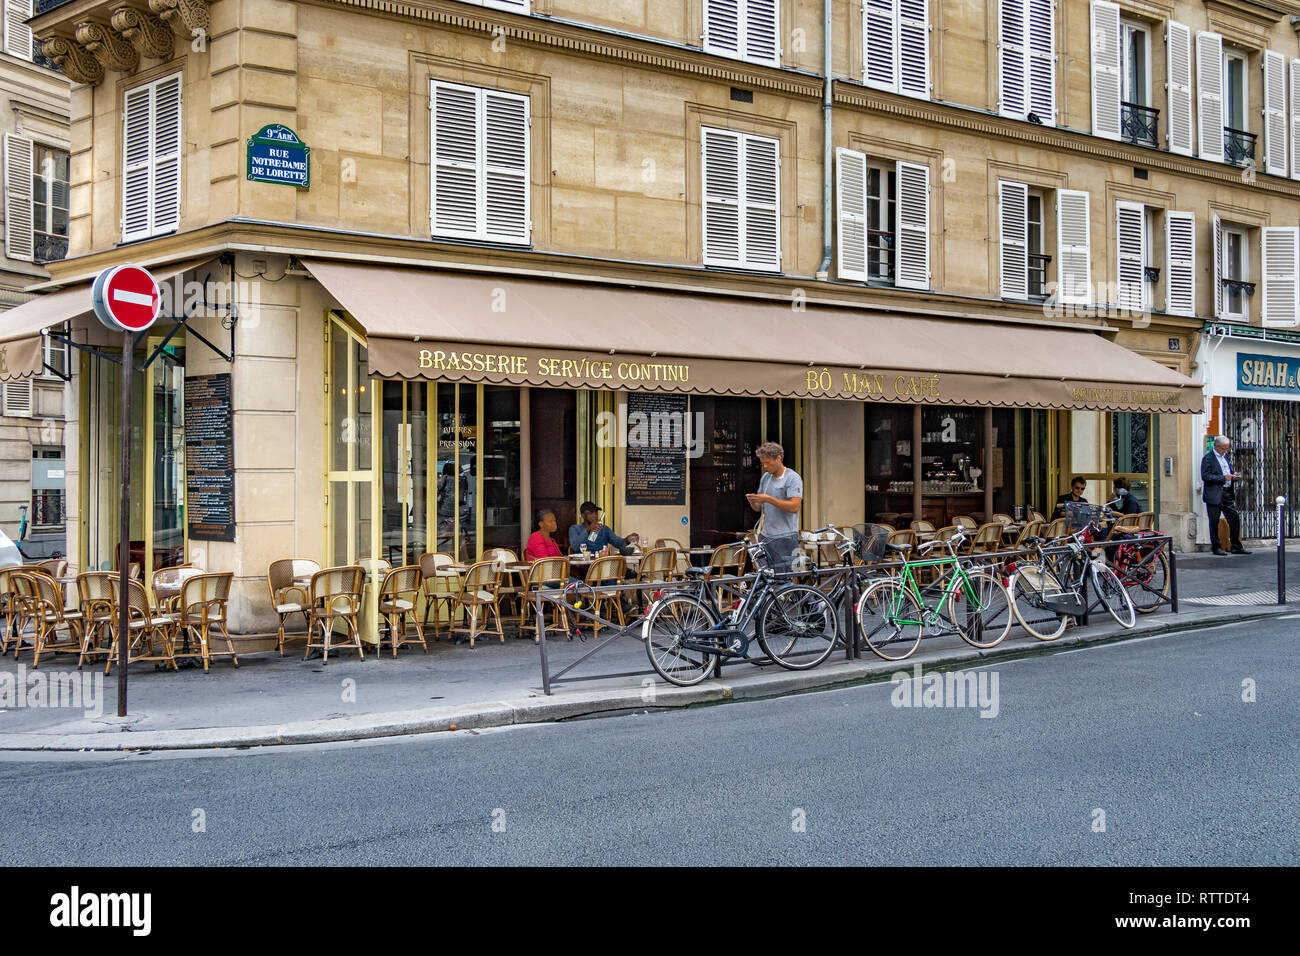 Bicycles against a railing  outside the Bo Man cafe and restaurant , Rue Notre-Dame-de-Lorette , Paris,France Stock Photo